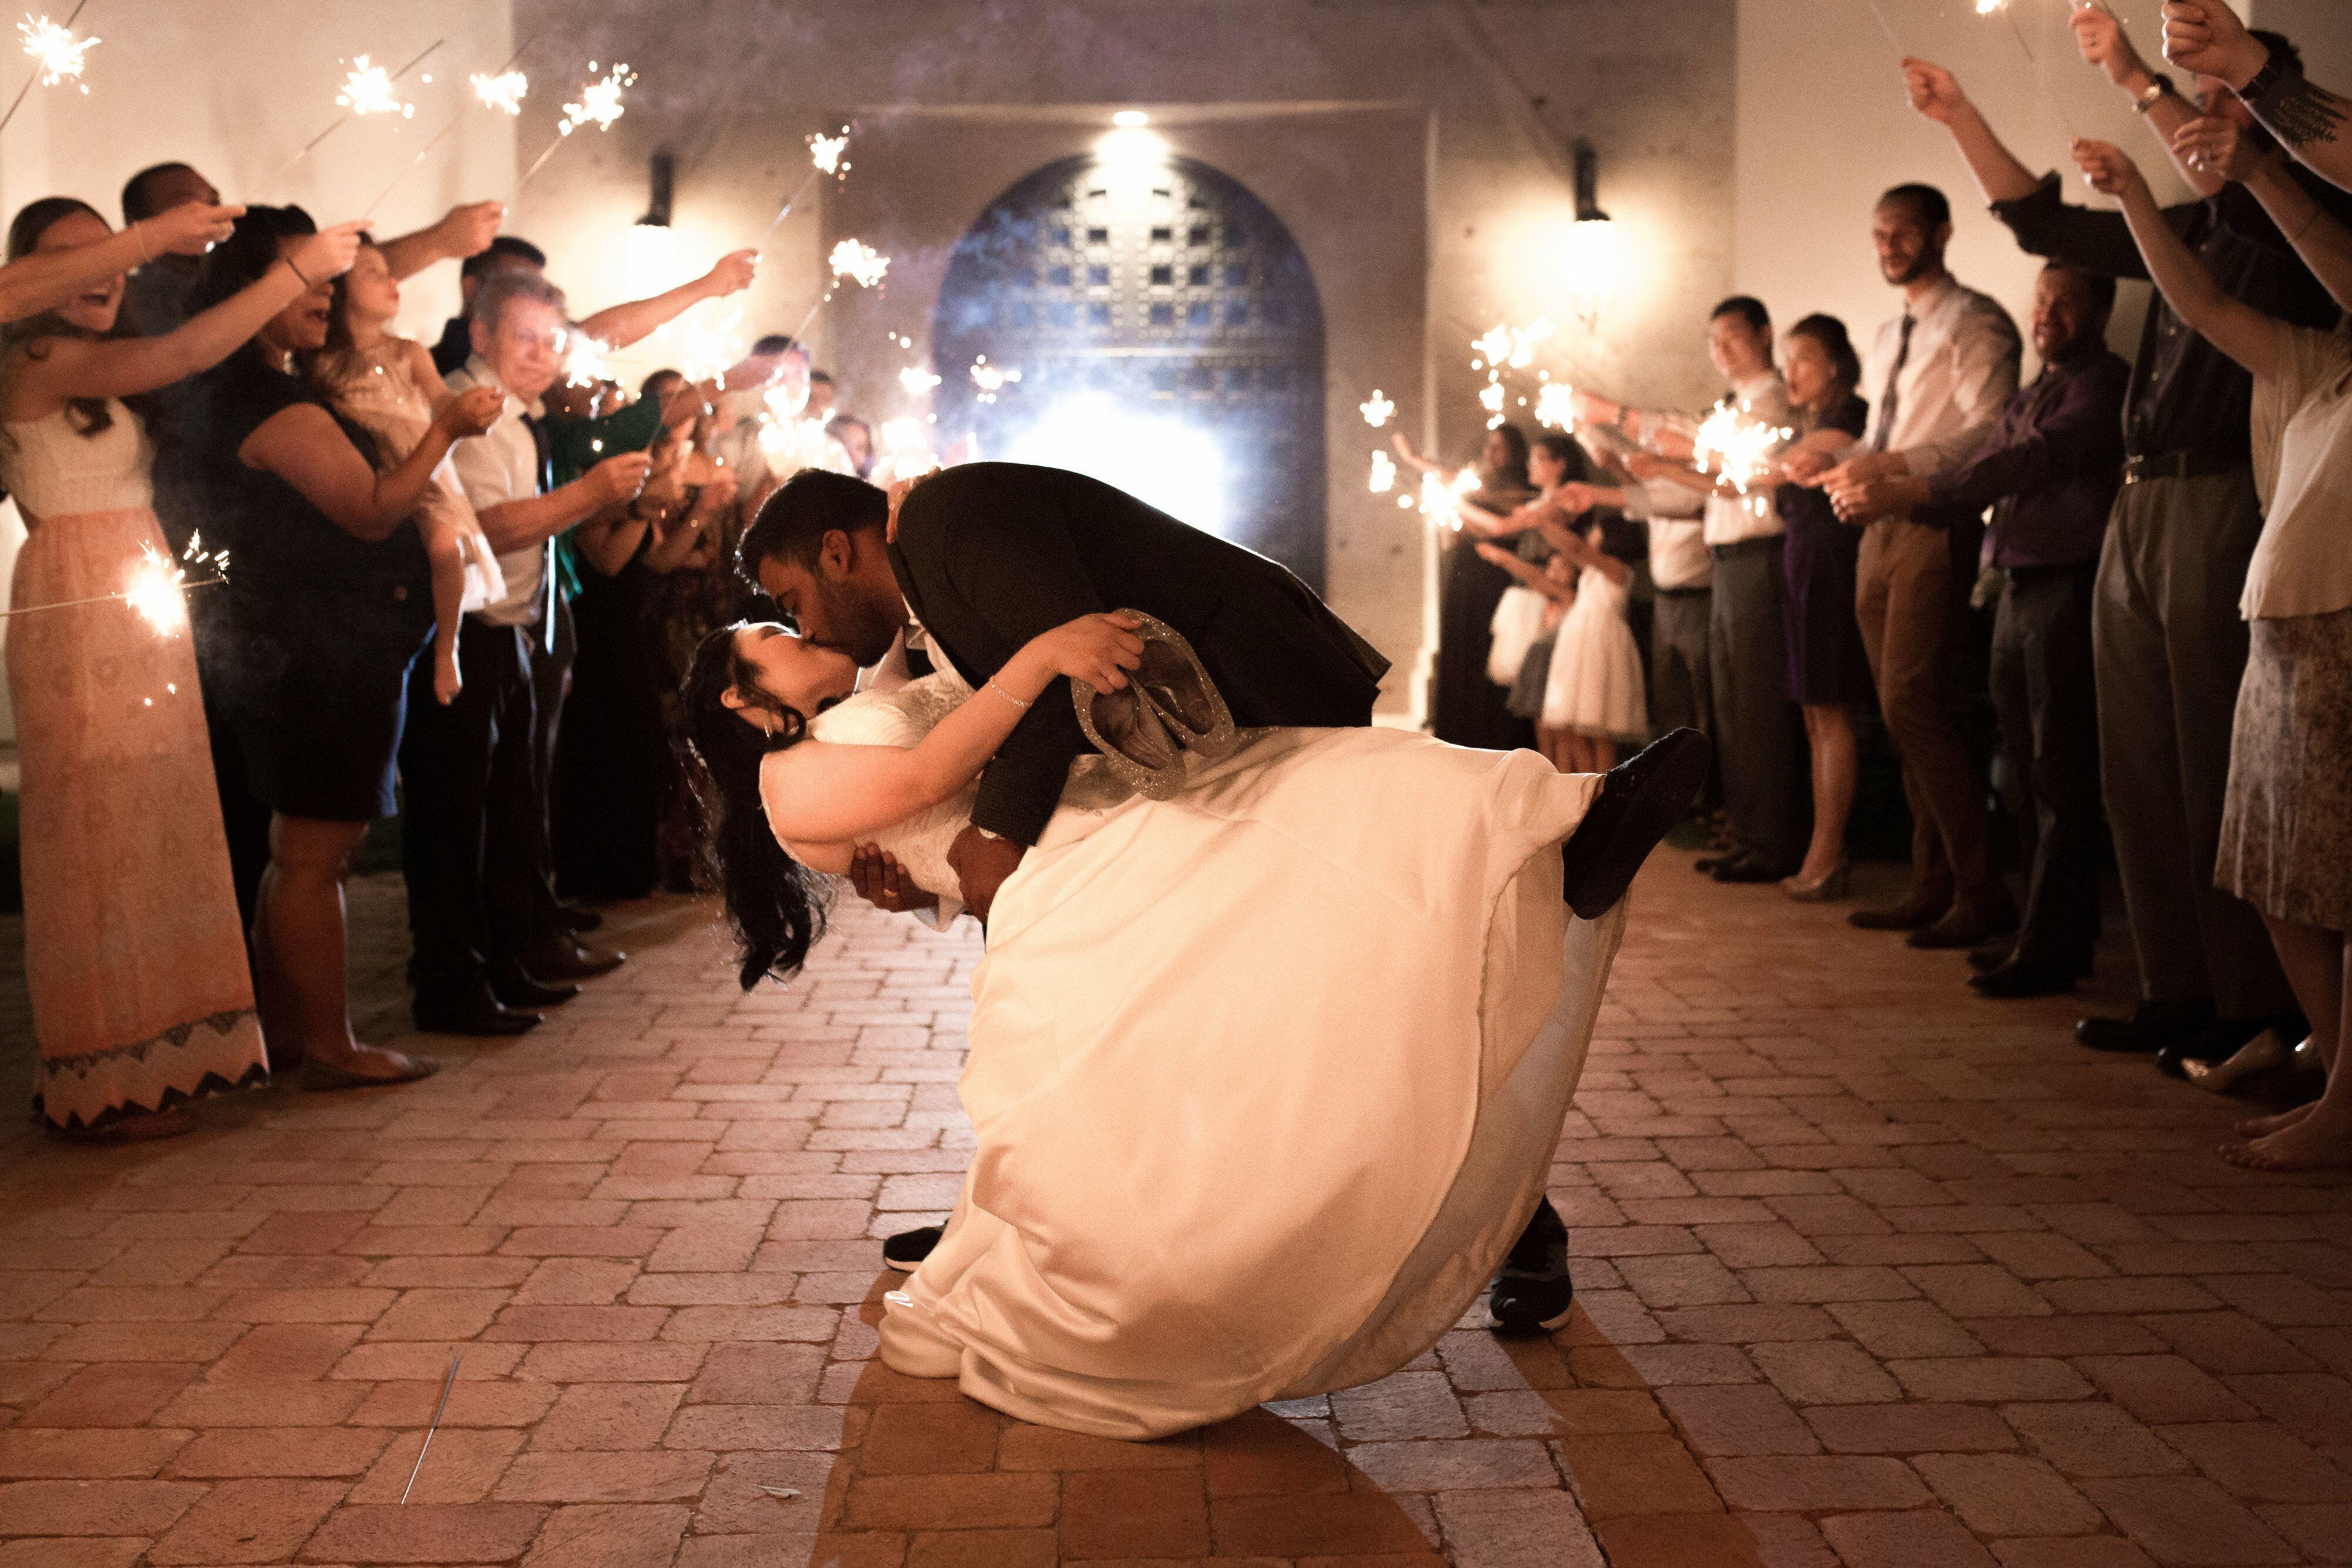 Wedding ceremony venues in yuma az the knot king of kings church goodyear az junglespirit Gallery